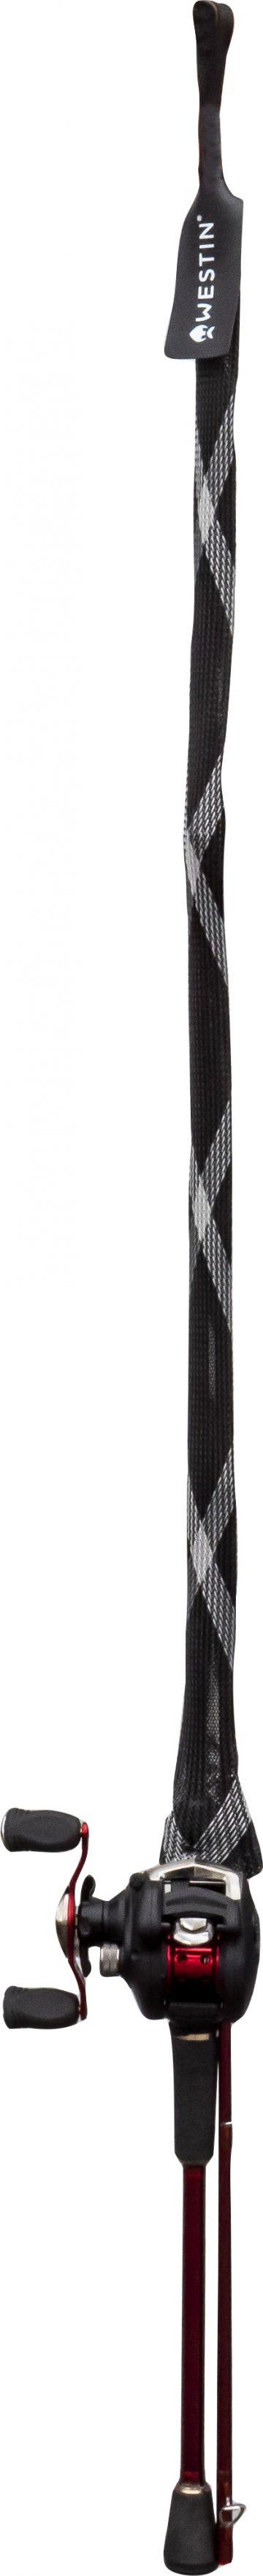 Westin Rod Cover Spin Split zwart - grijs roofvis visfoudraal 2m55